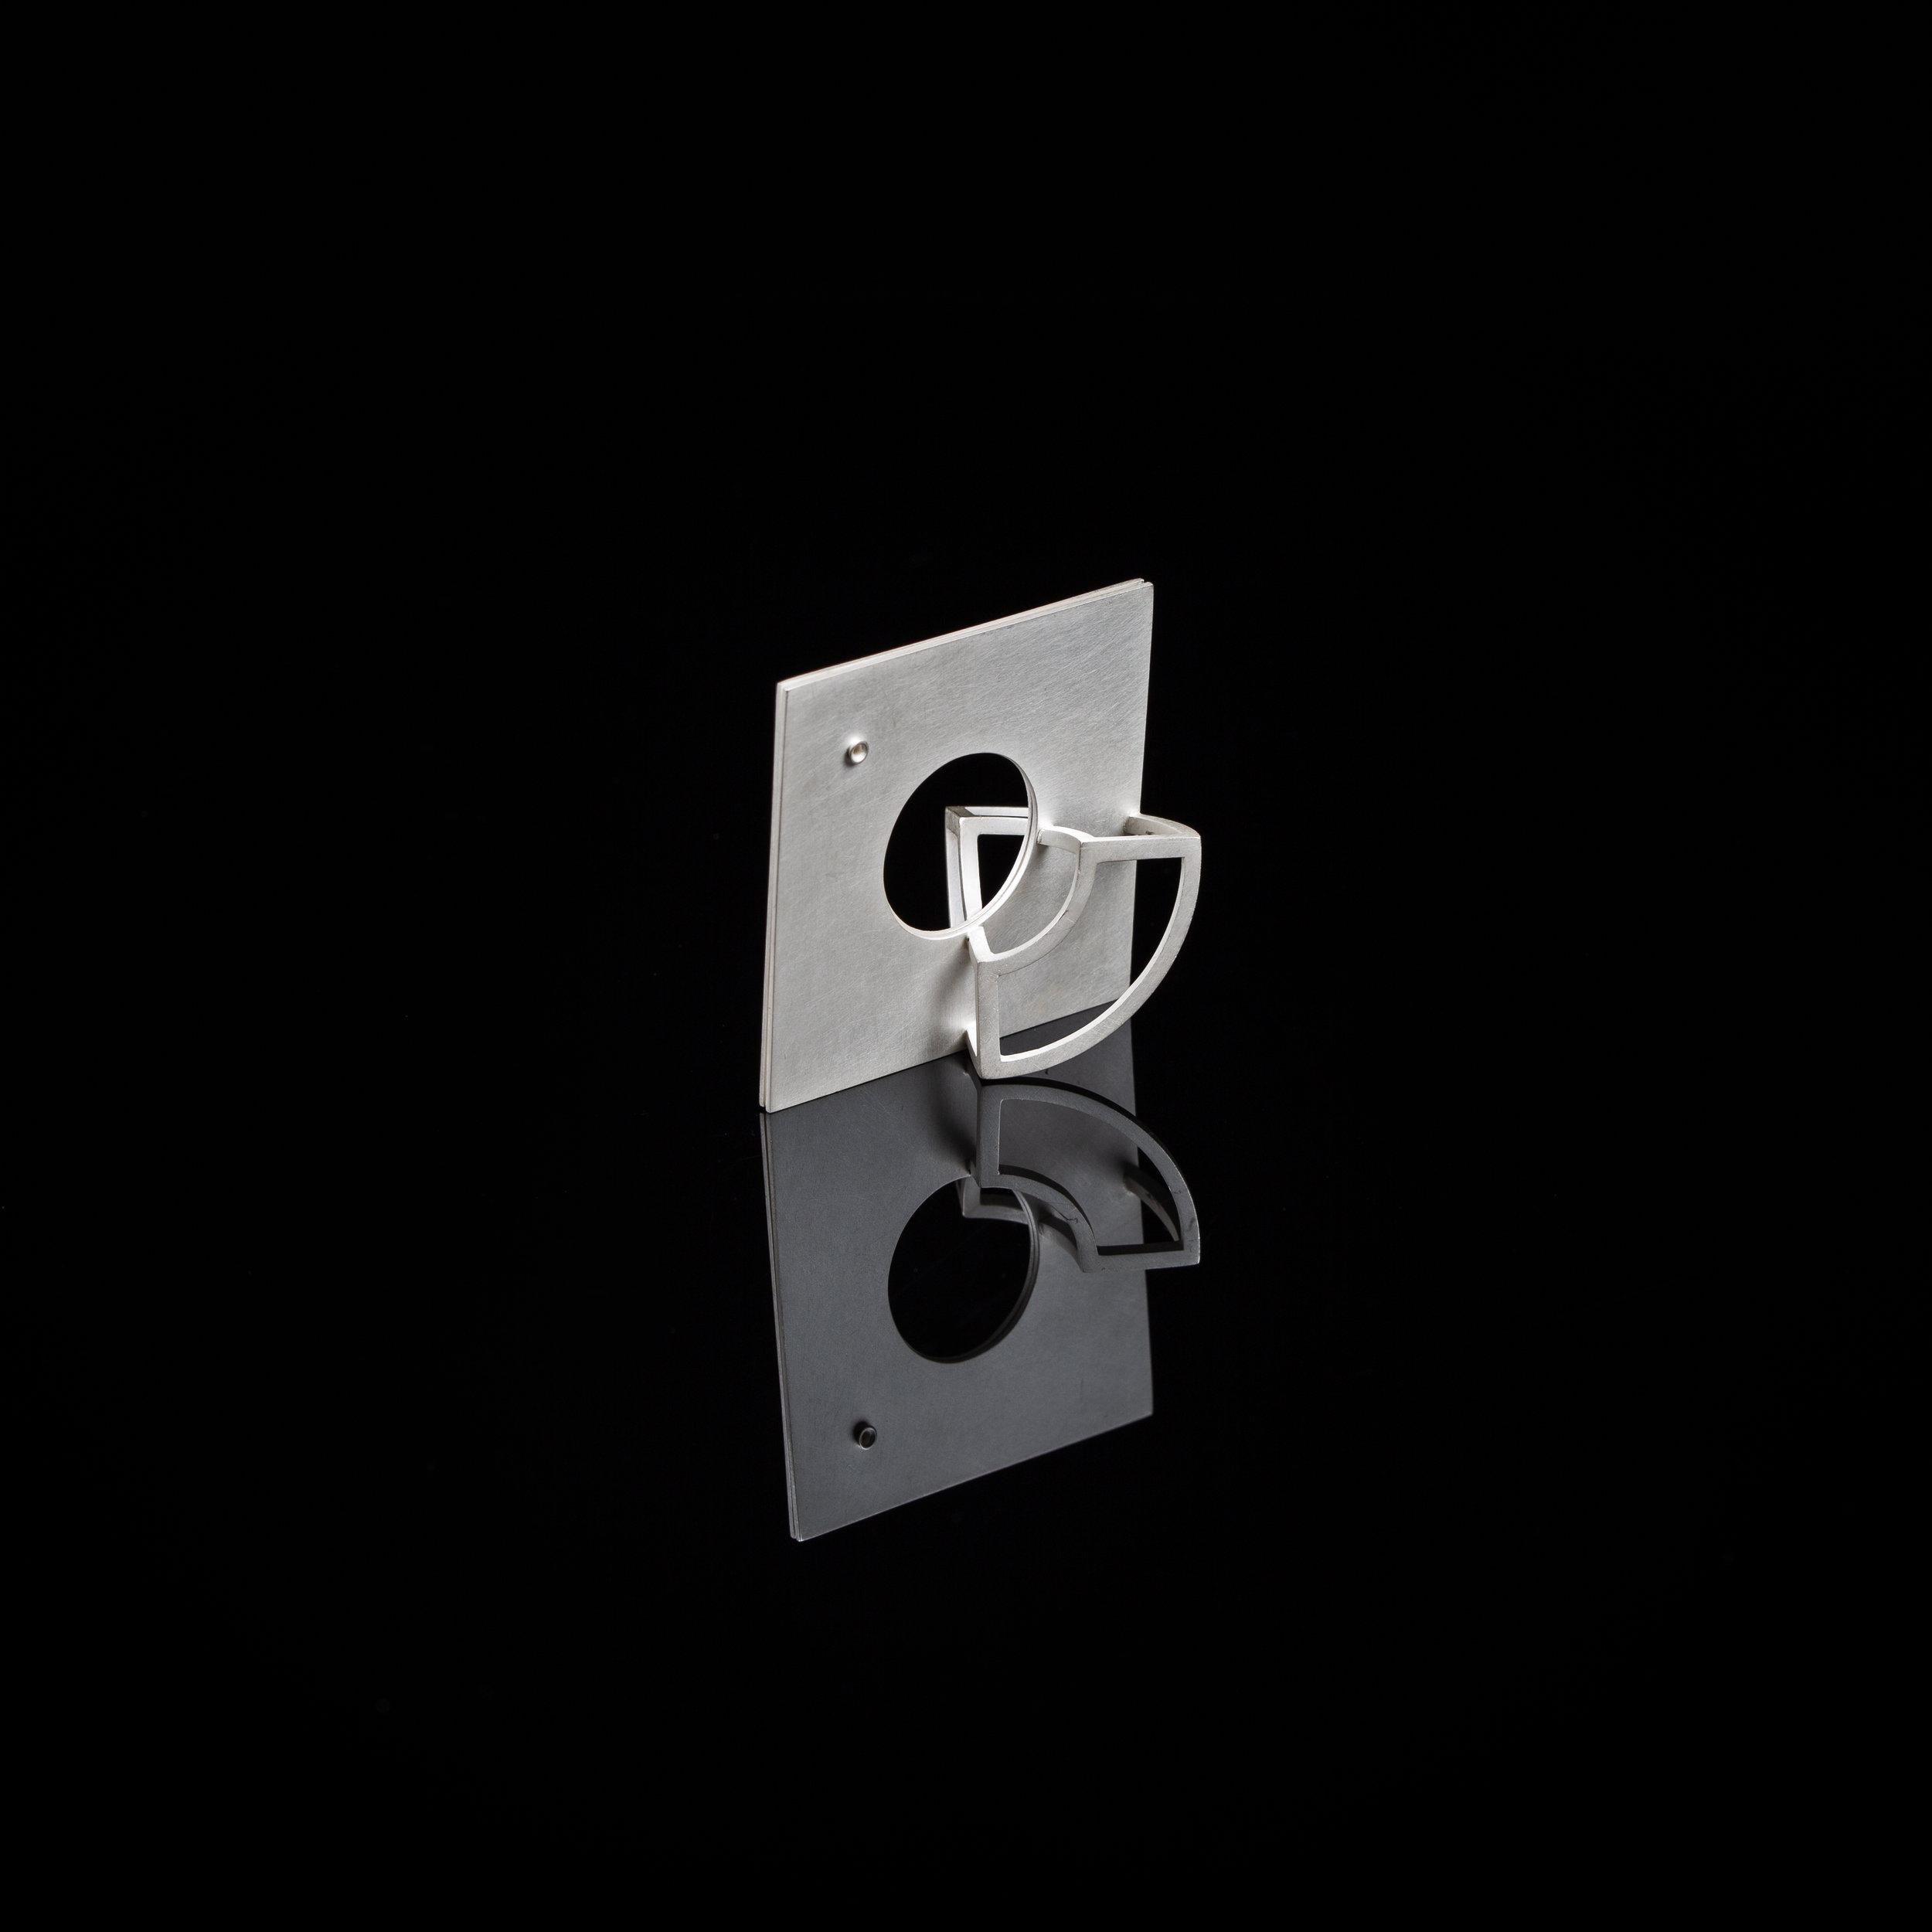 Curious Constructions | Pendant   Sterling Silver |4.1 x 4.1 x 3 cm